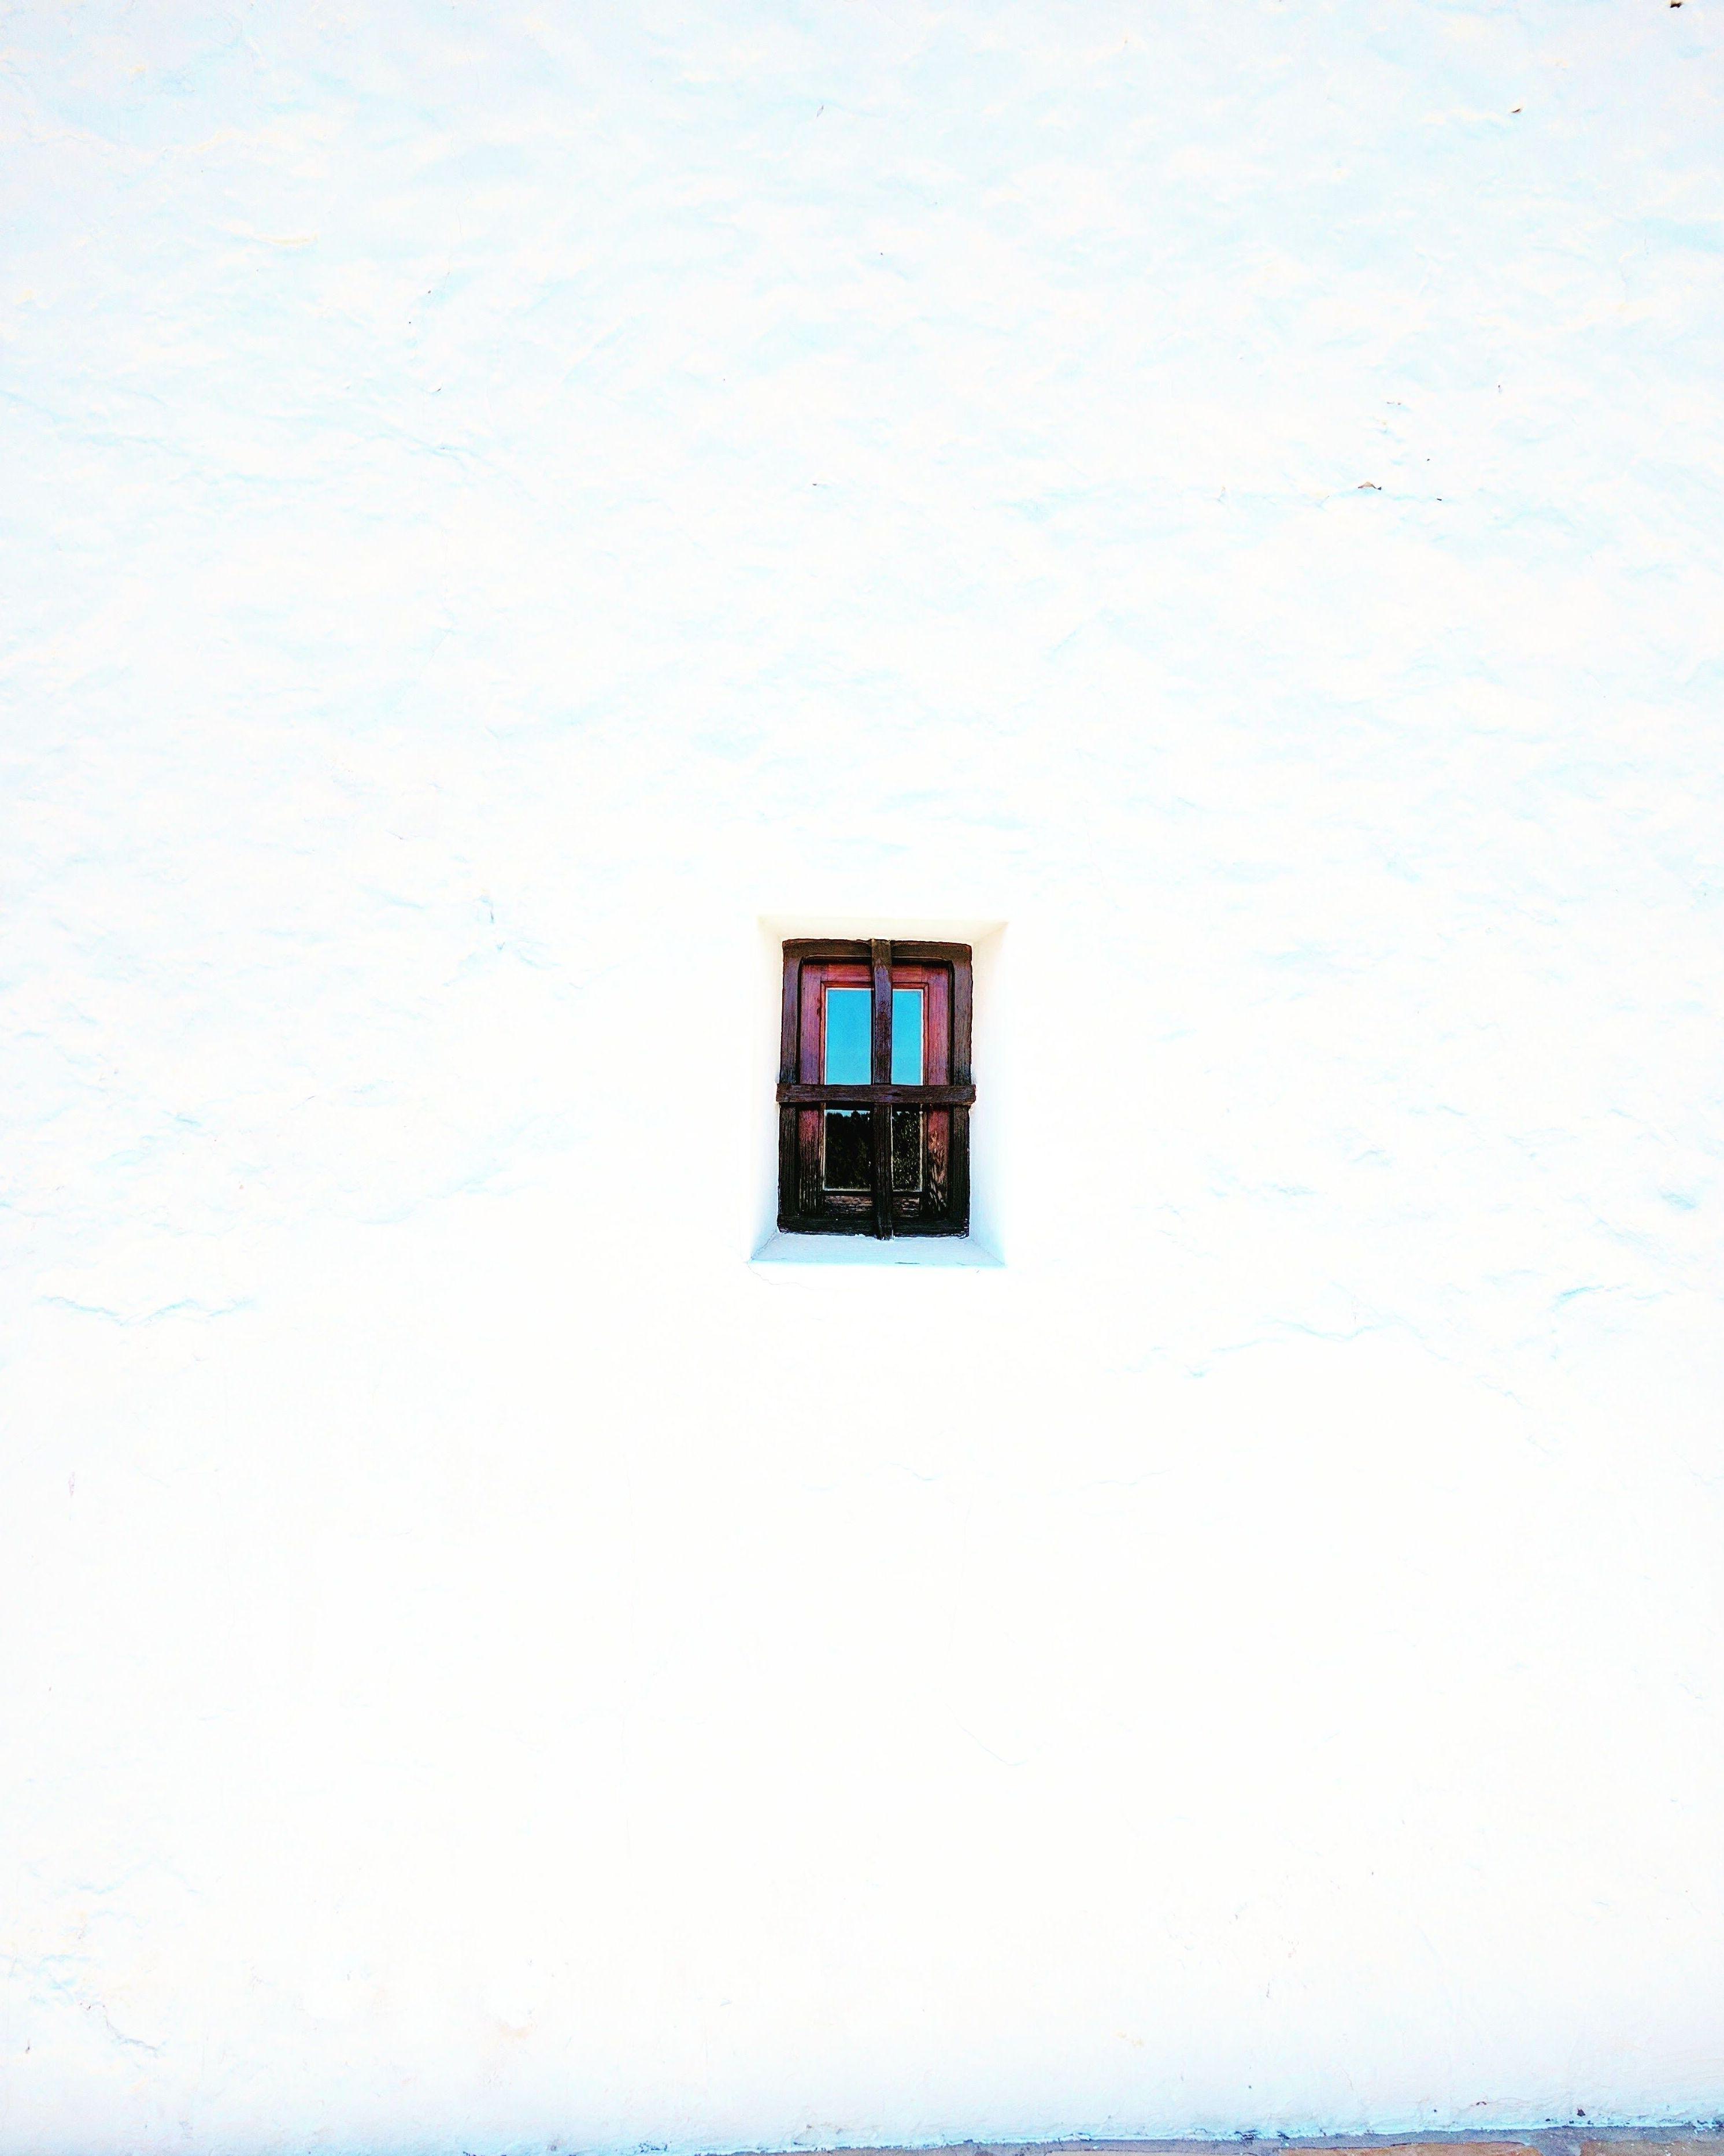 Foto 49 de Abogados en Eivissa | Raad Abogados. Tel 691 270 993